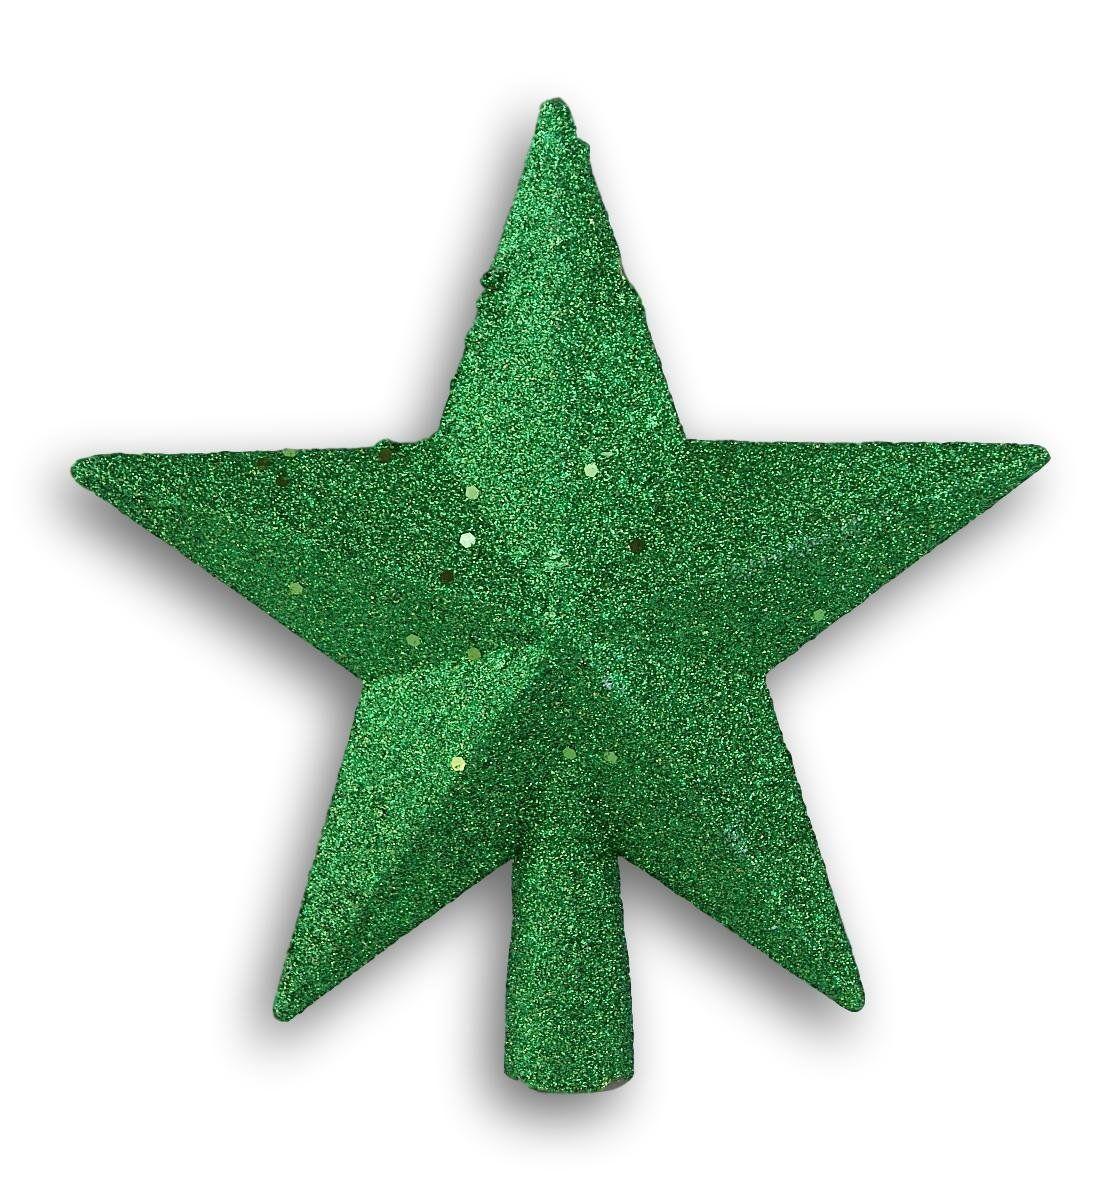 Green Glitter 5 Point Star Tree Topper